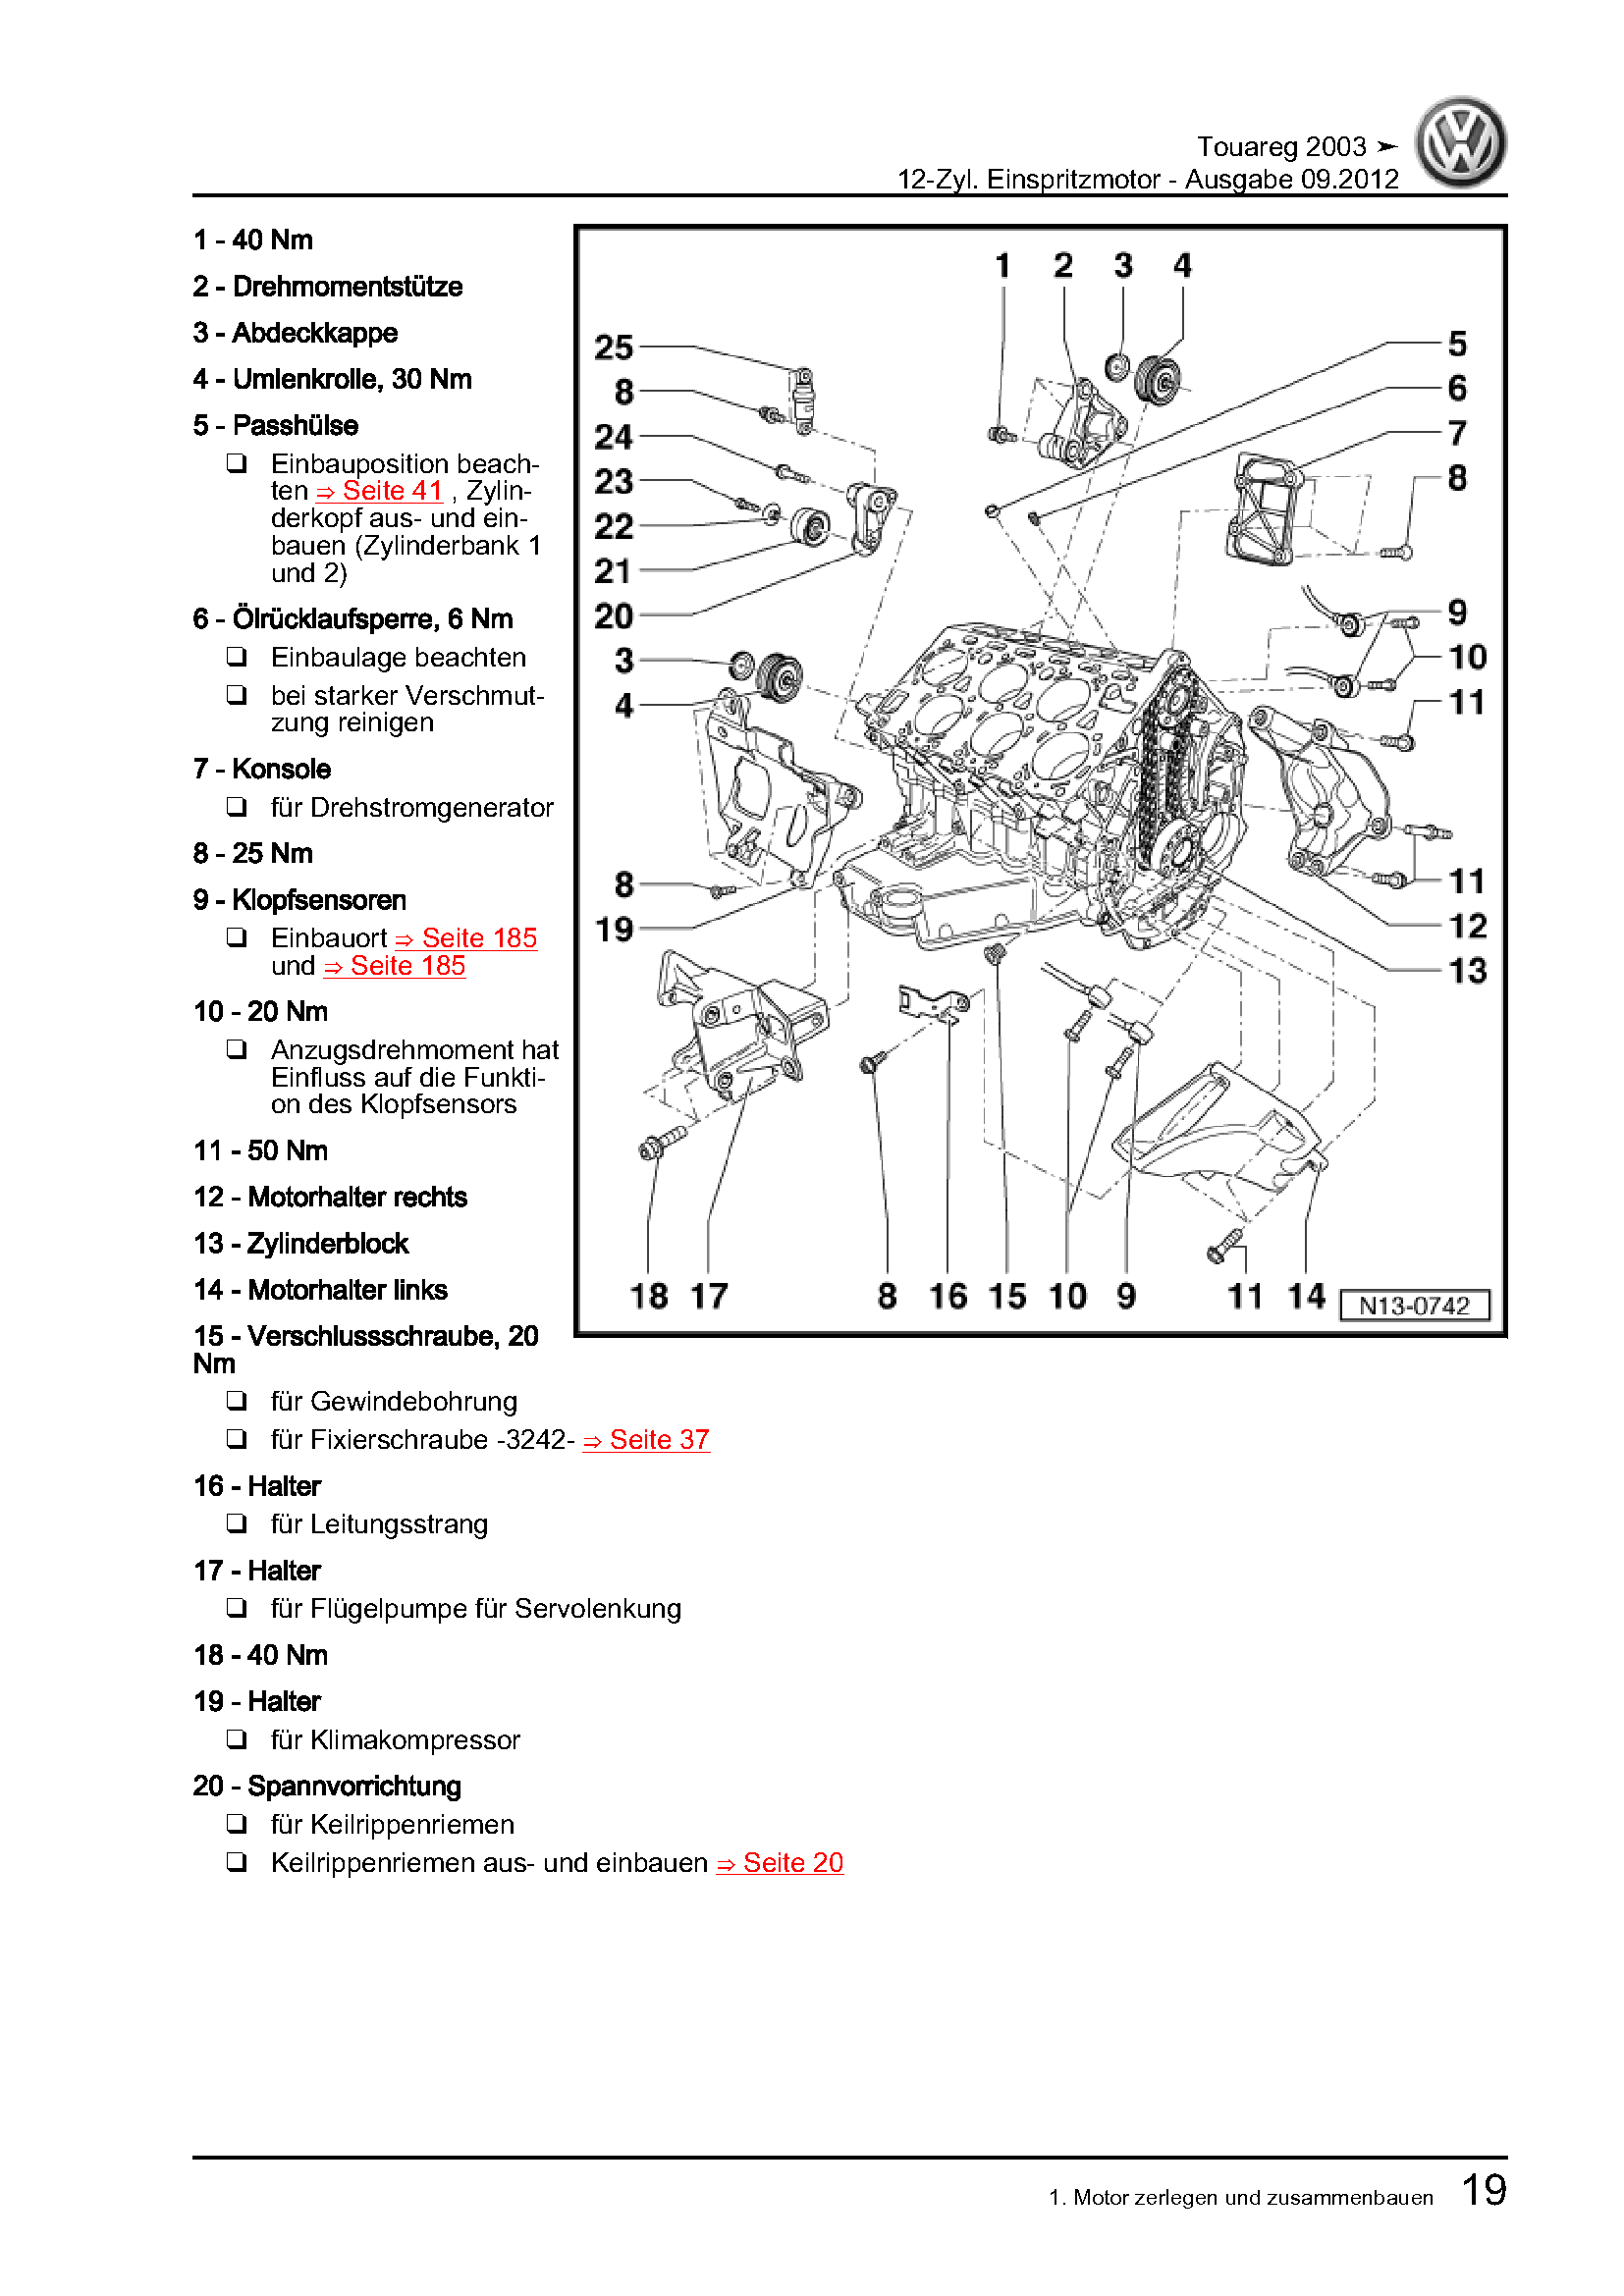 vw-touareg-7l-0023-motor_6_0_liter_12_zylinder_331_kw_1.png